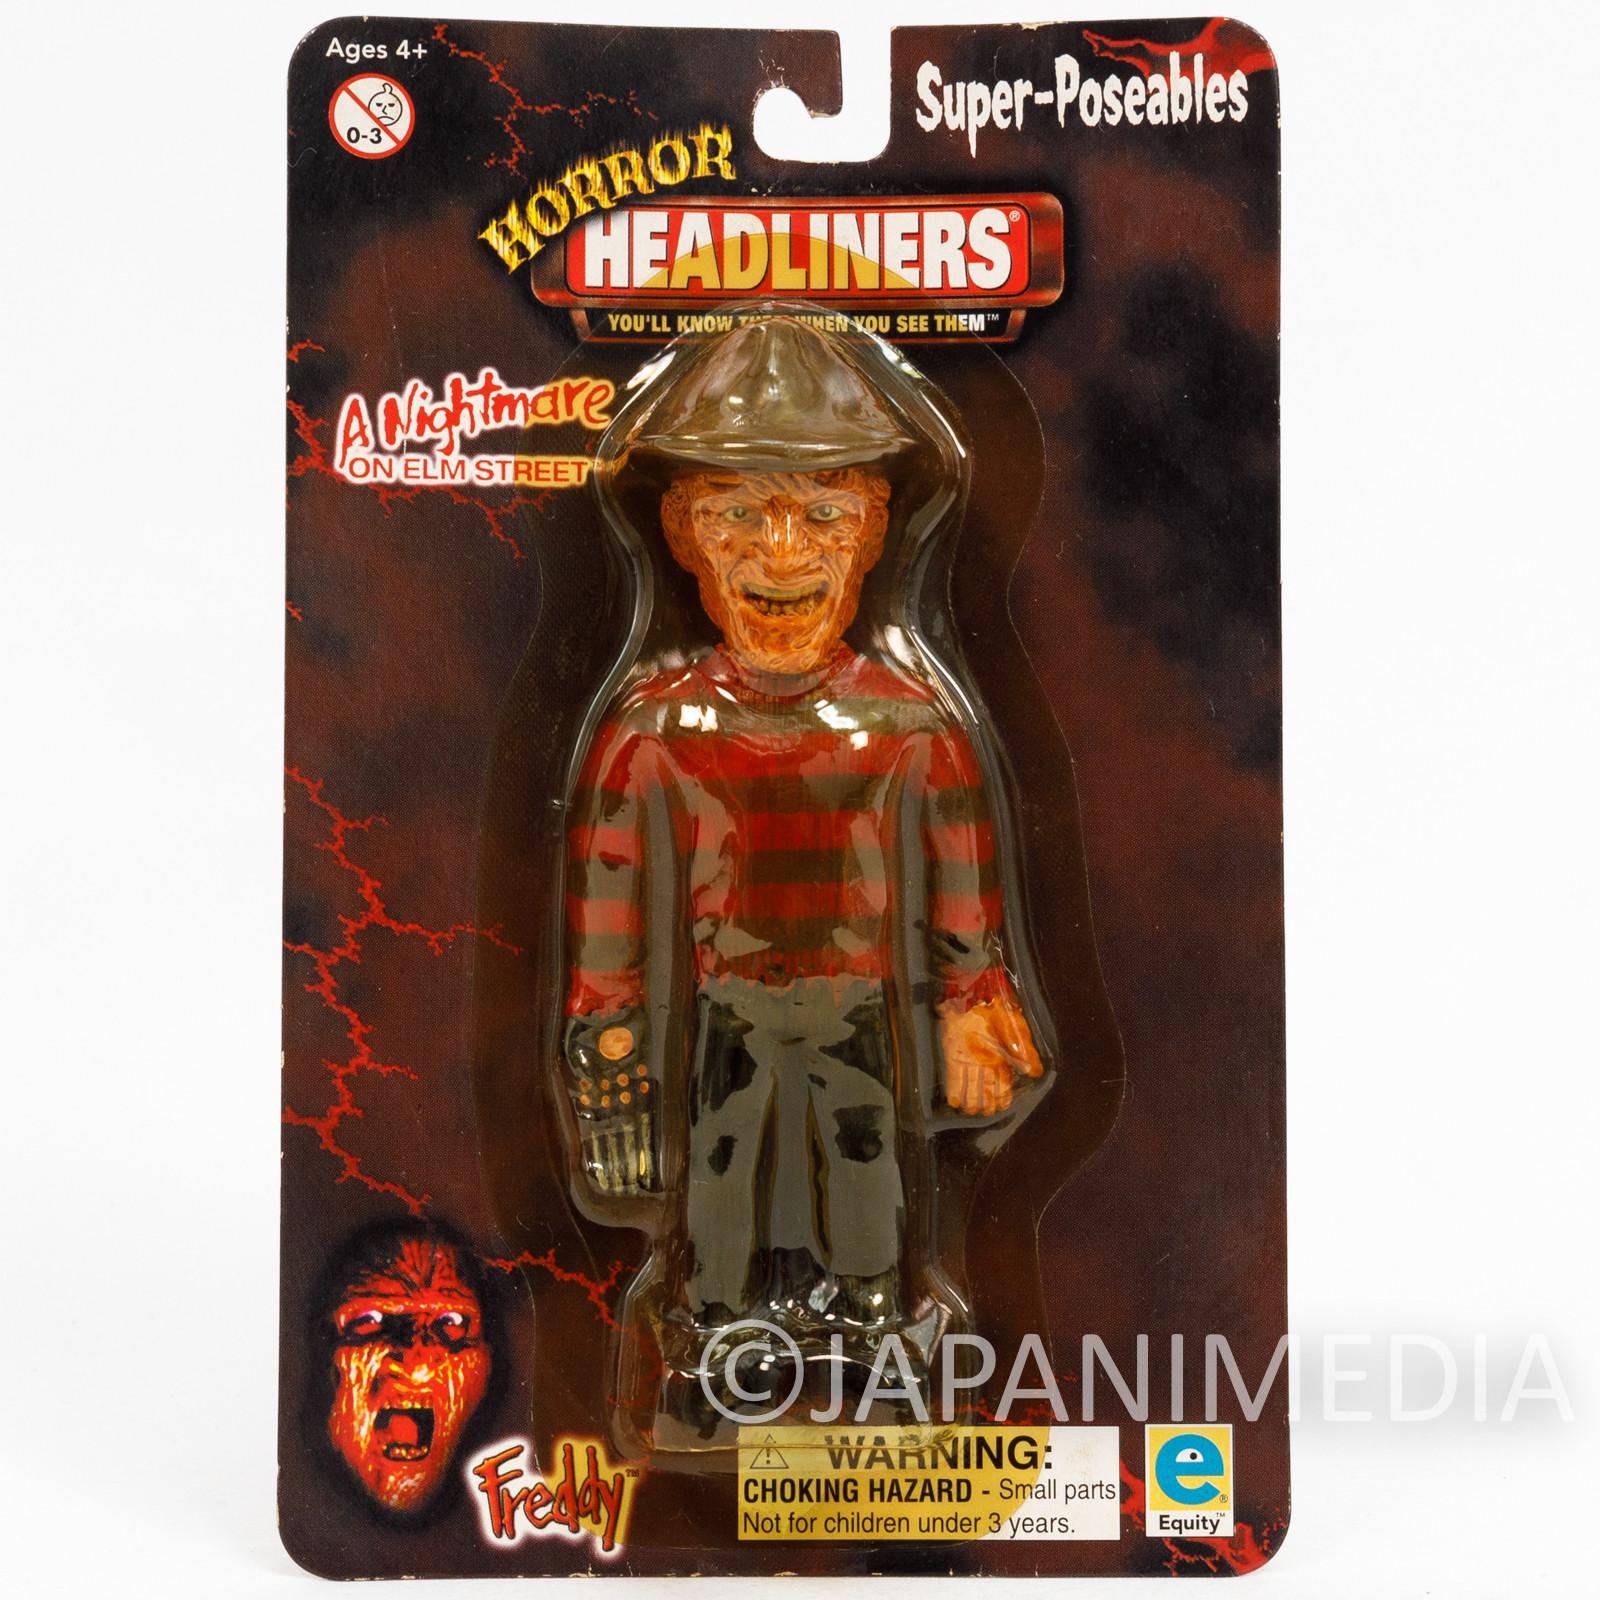 A Nightmare on Elm Street FREDDY KRUEGER Super Poseable Figure Horror Headliners